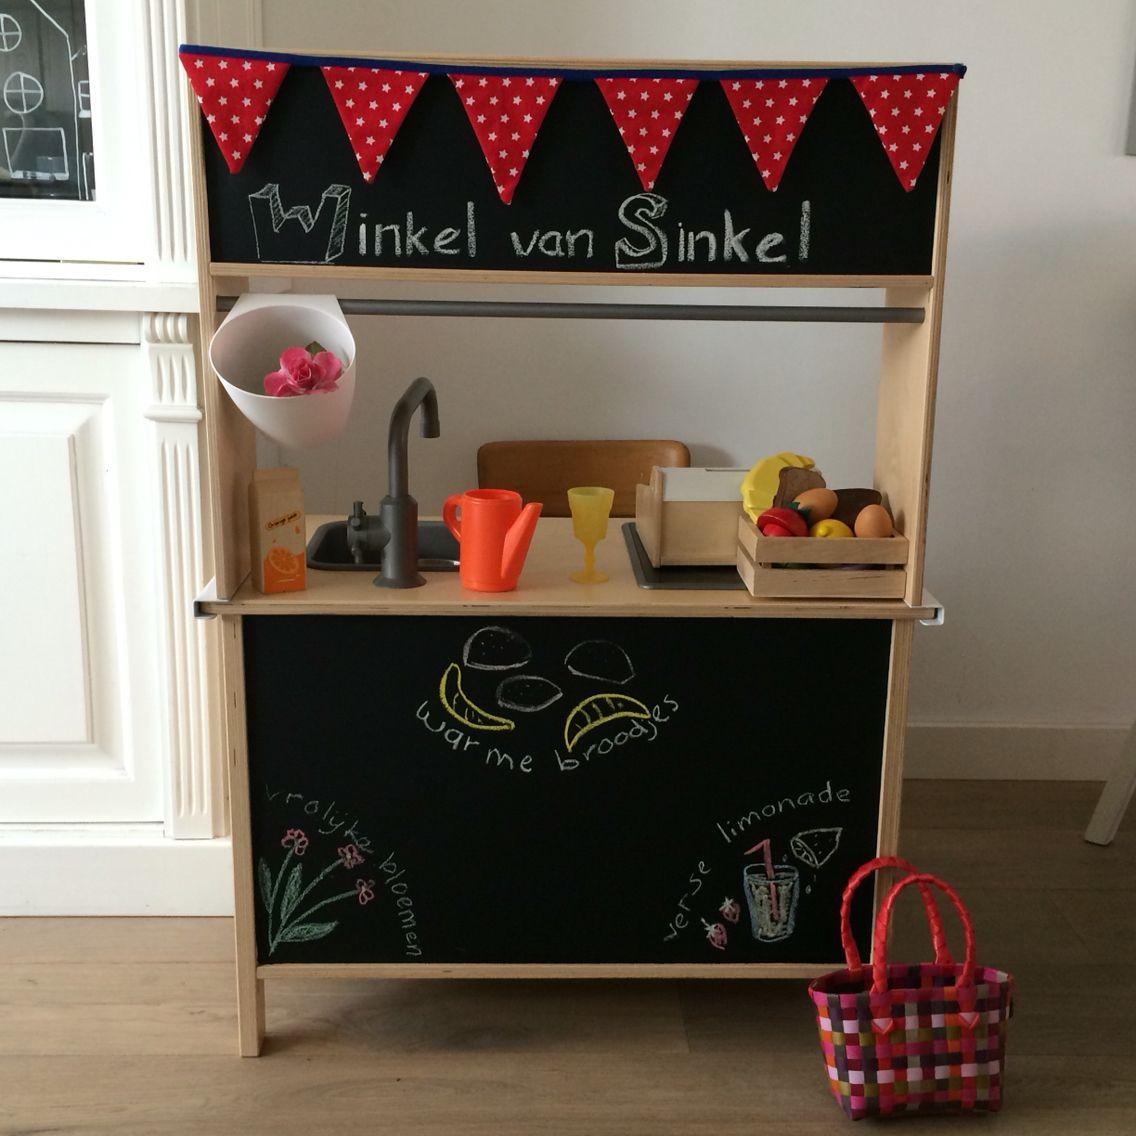 ikea duktig keukentje en winkel samen ikea hack. Black Bedroom Furniture Sets. Home Design Ideas